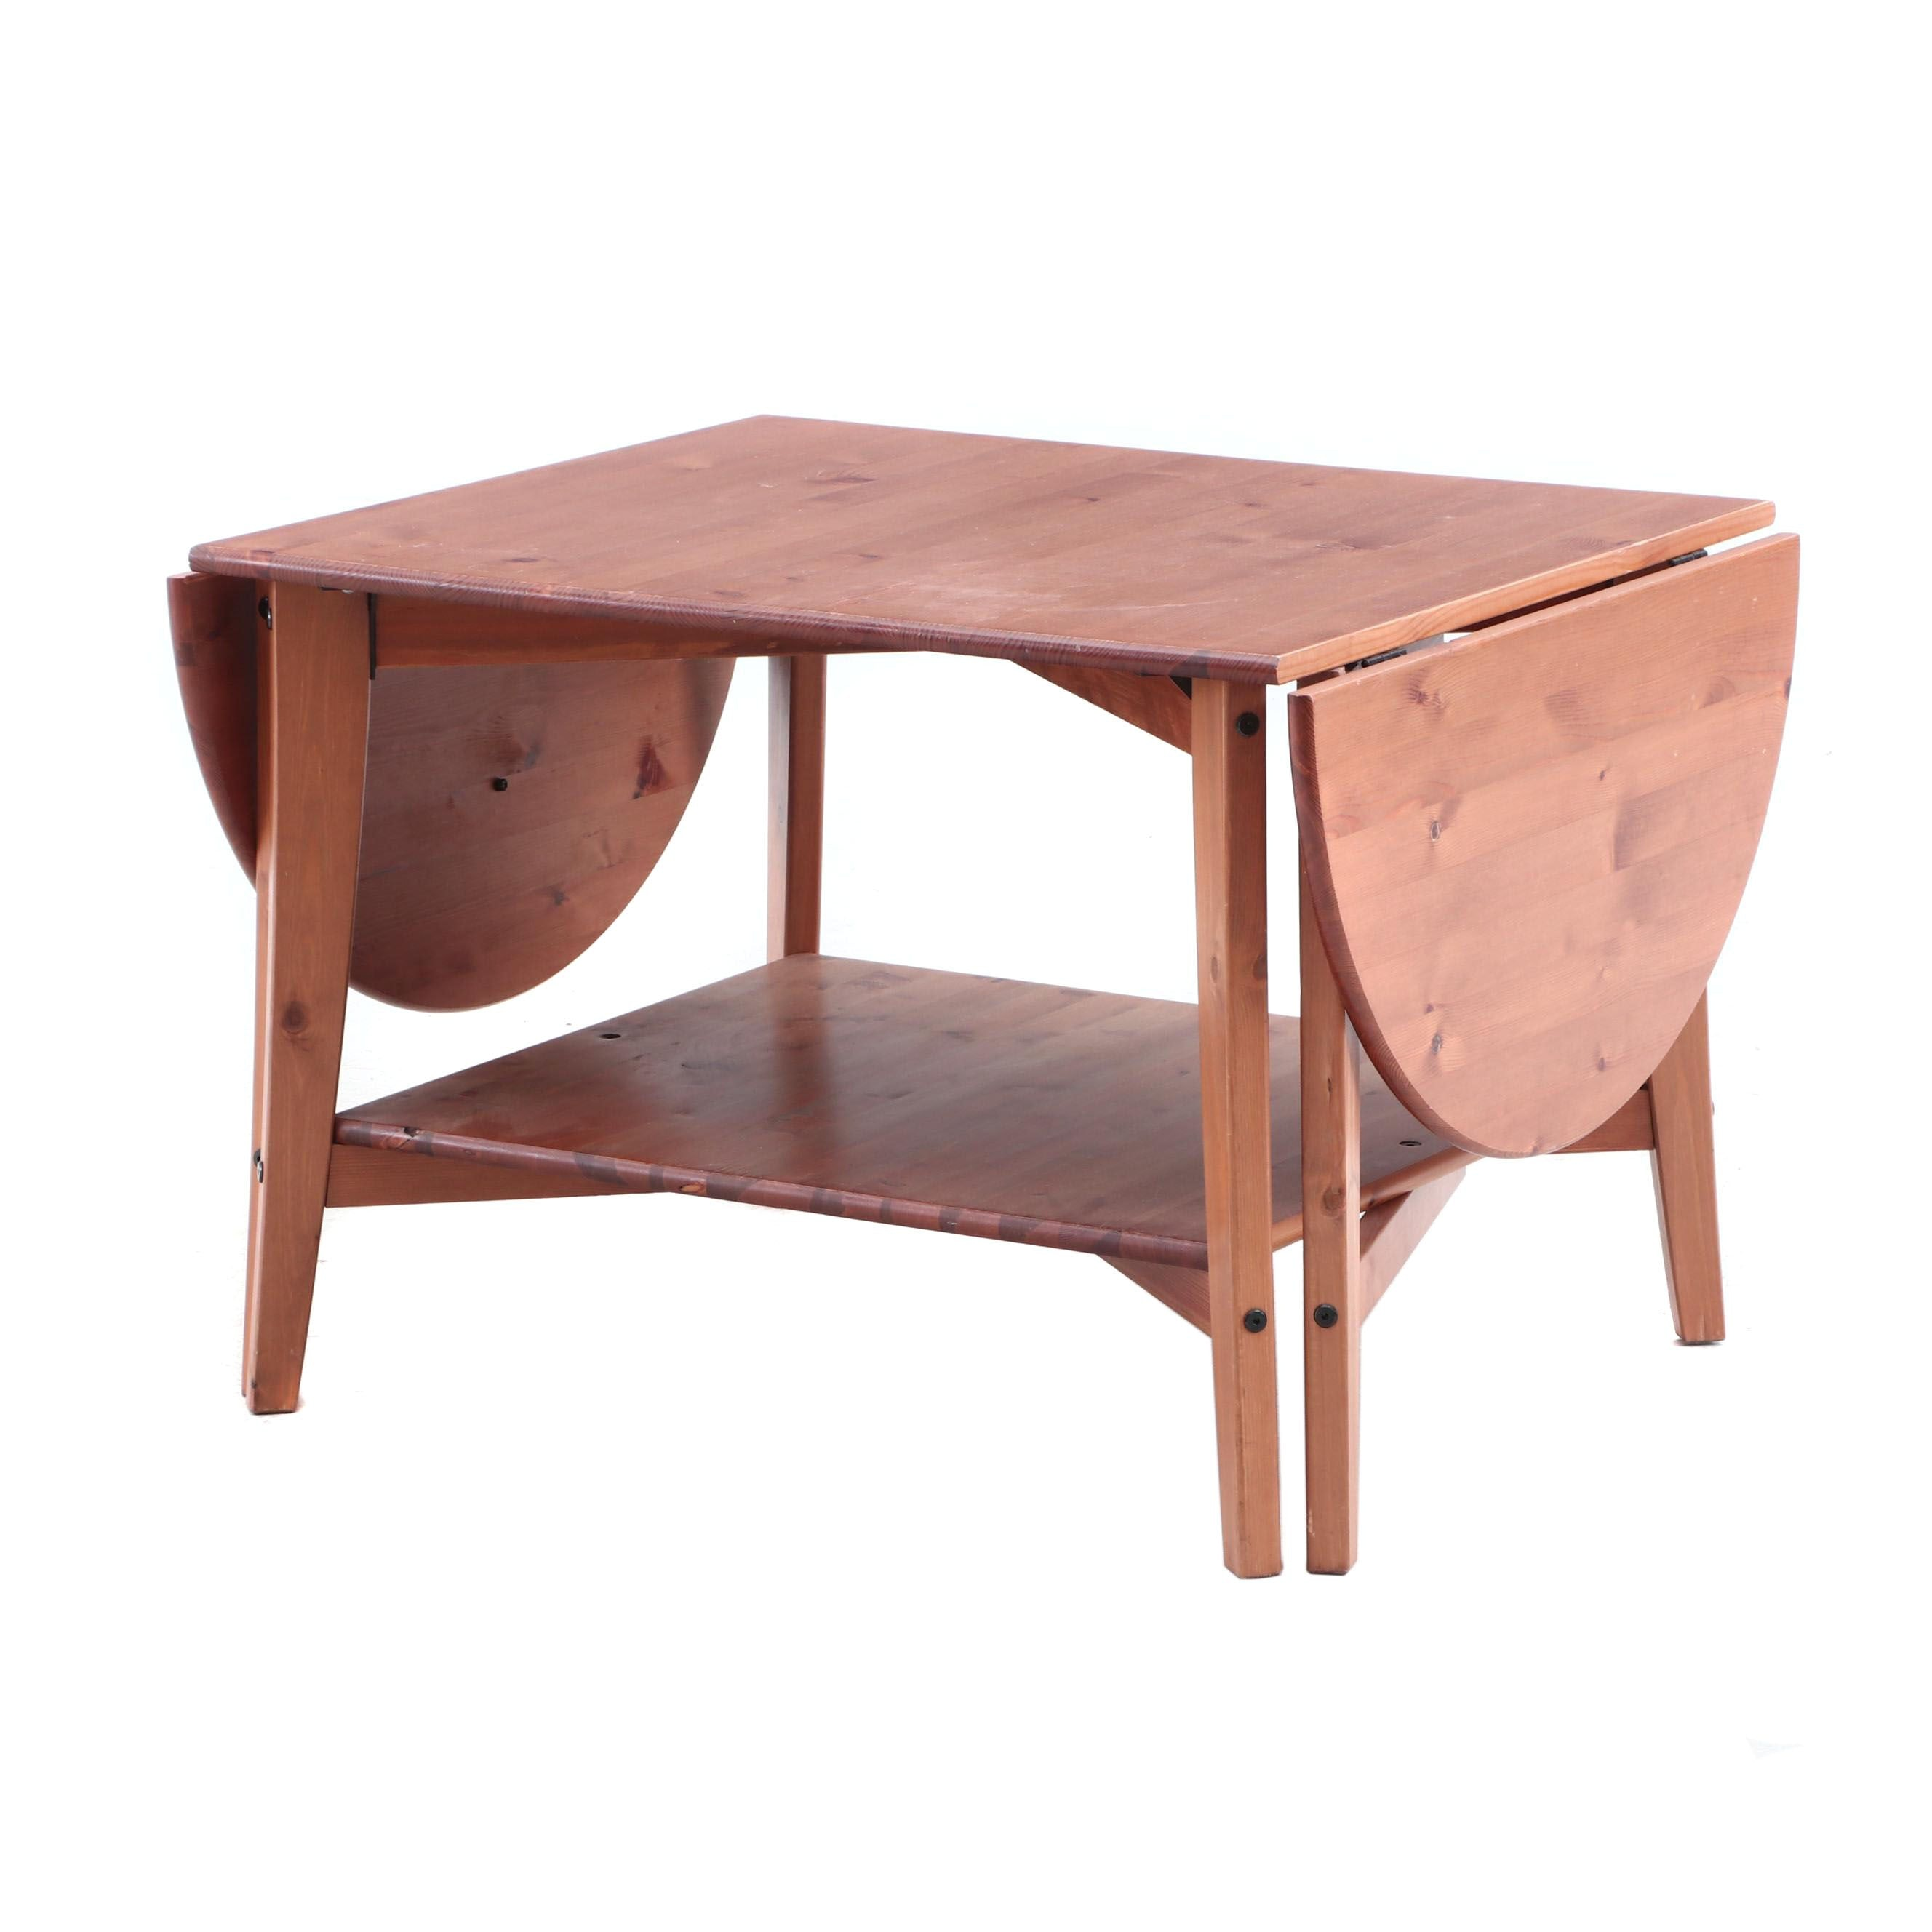 Drop Leaf Coffee Table in Pine